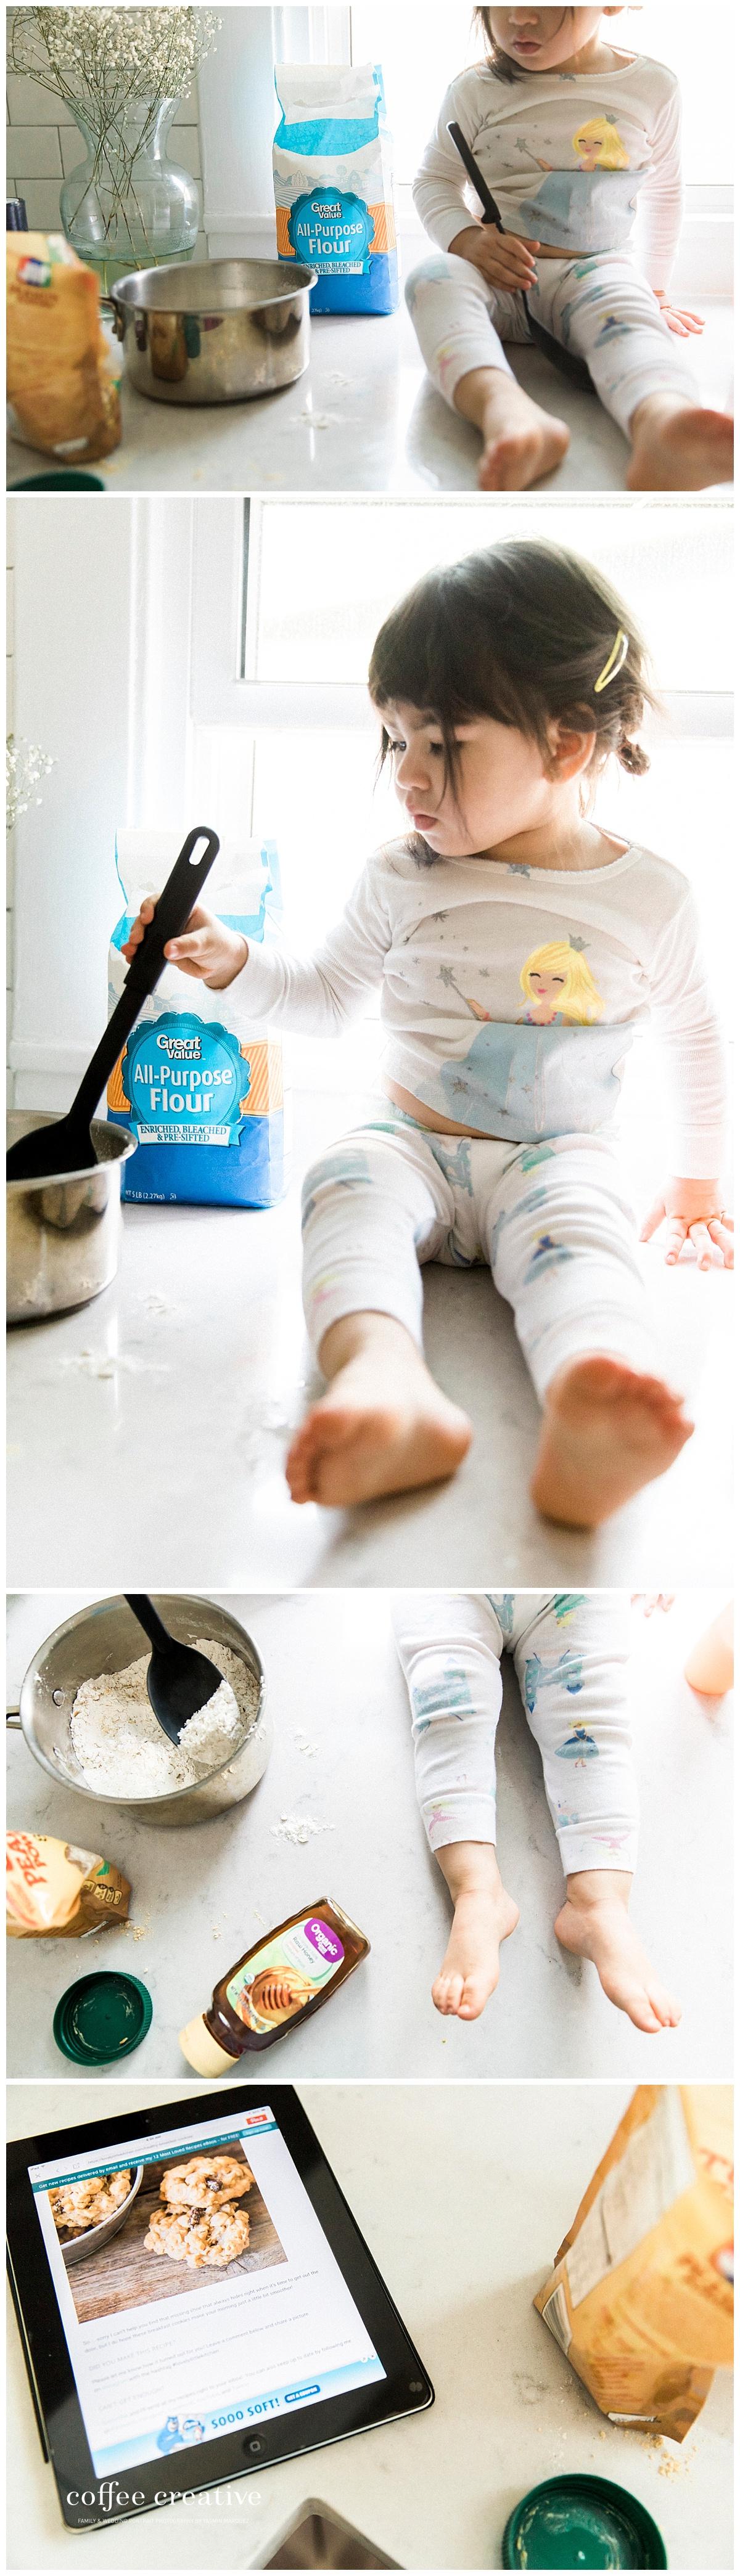 Baking and bonding | Healthy Cookies